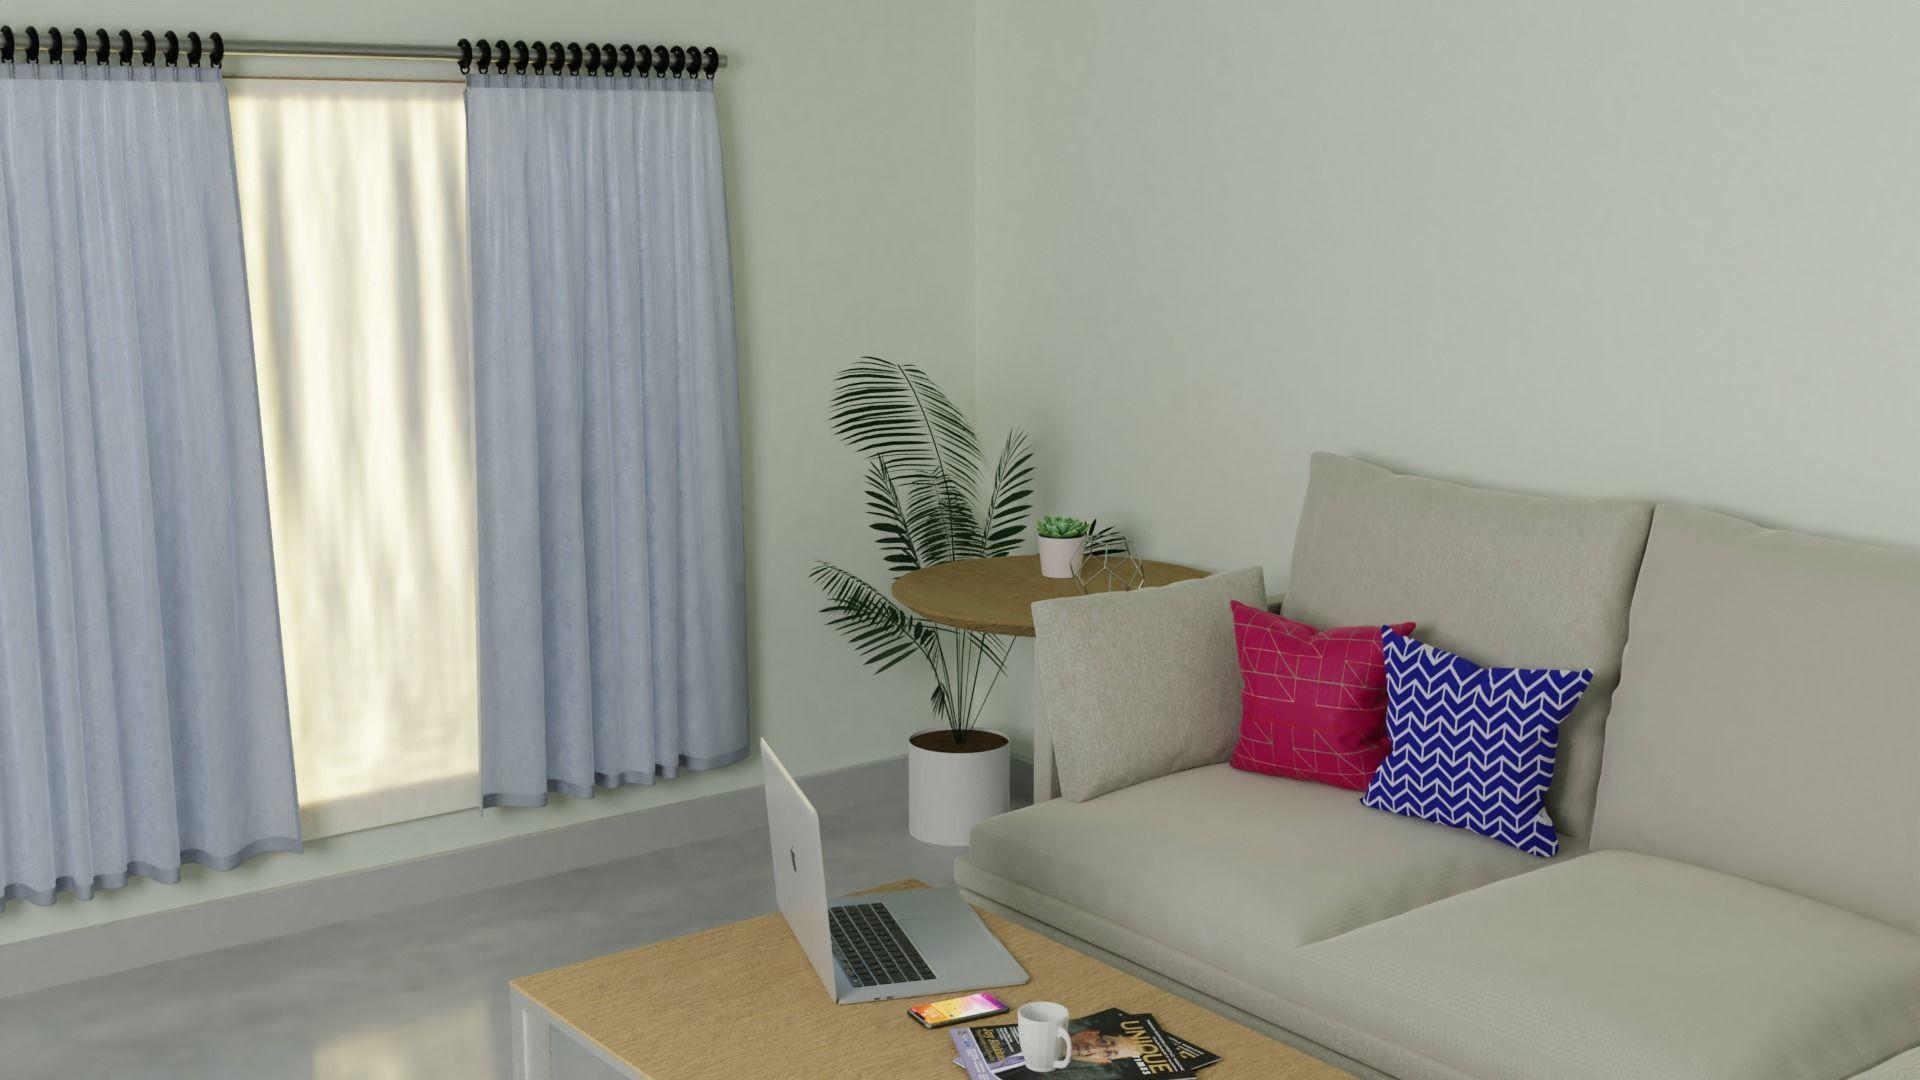 A modern room